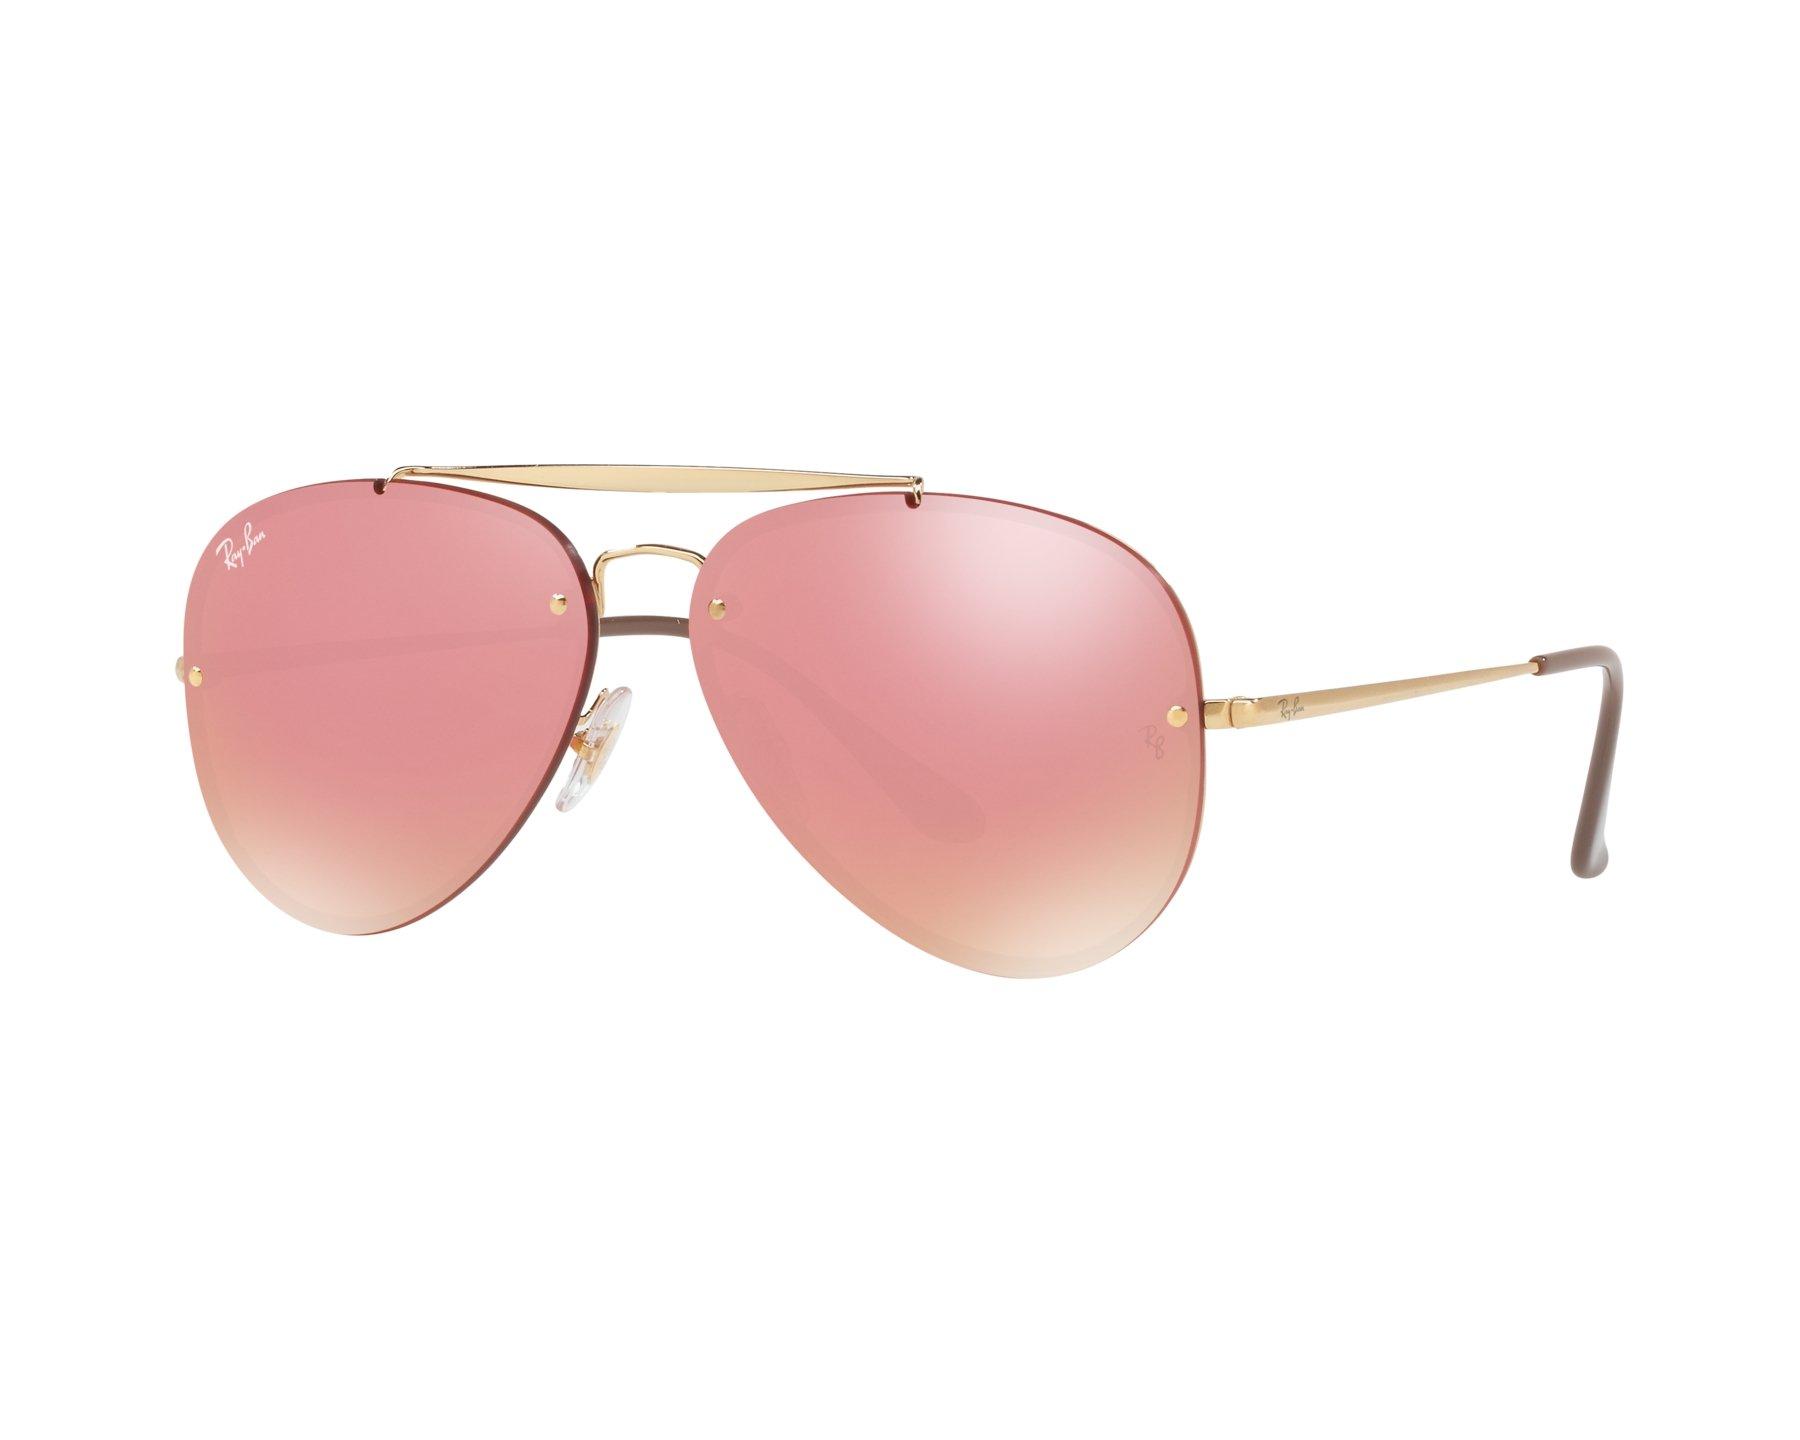 Sunglasses Ray-Ban RB-3584-N 9052E4 61-13 Gold 3dd91cb63ba1